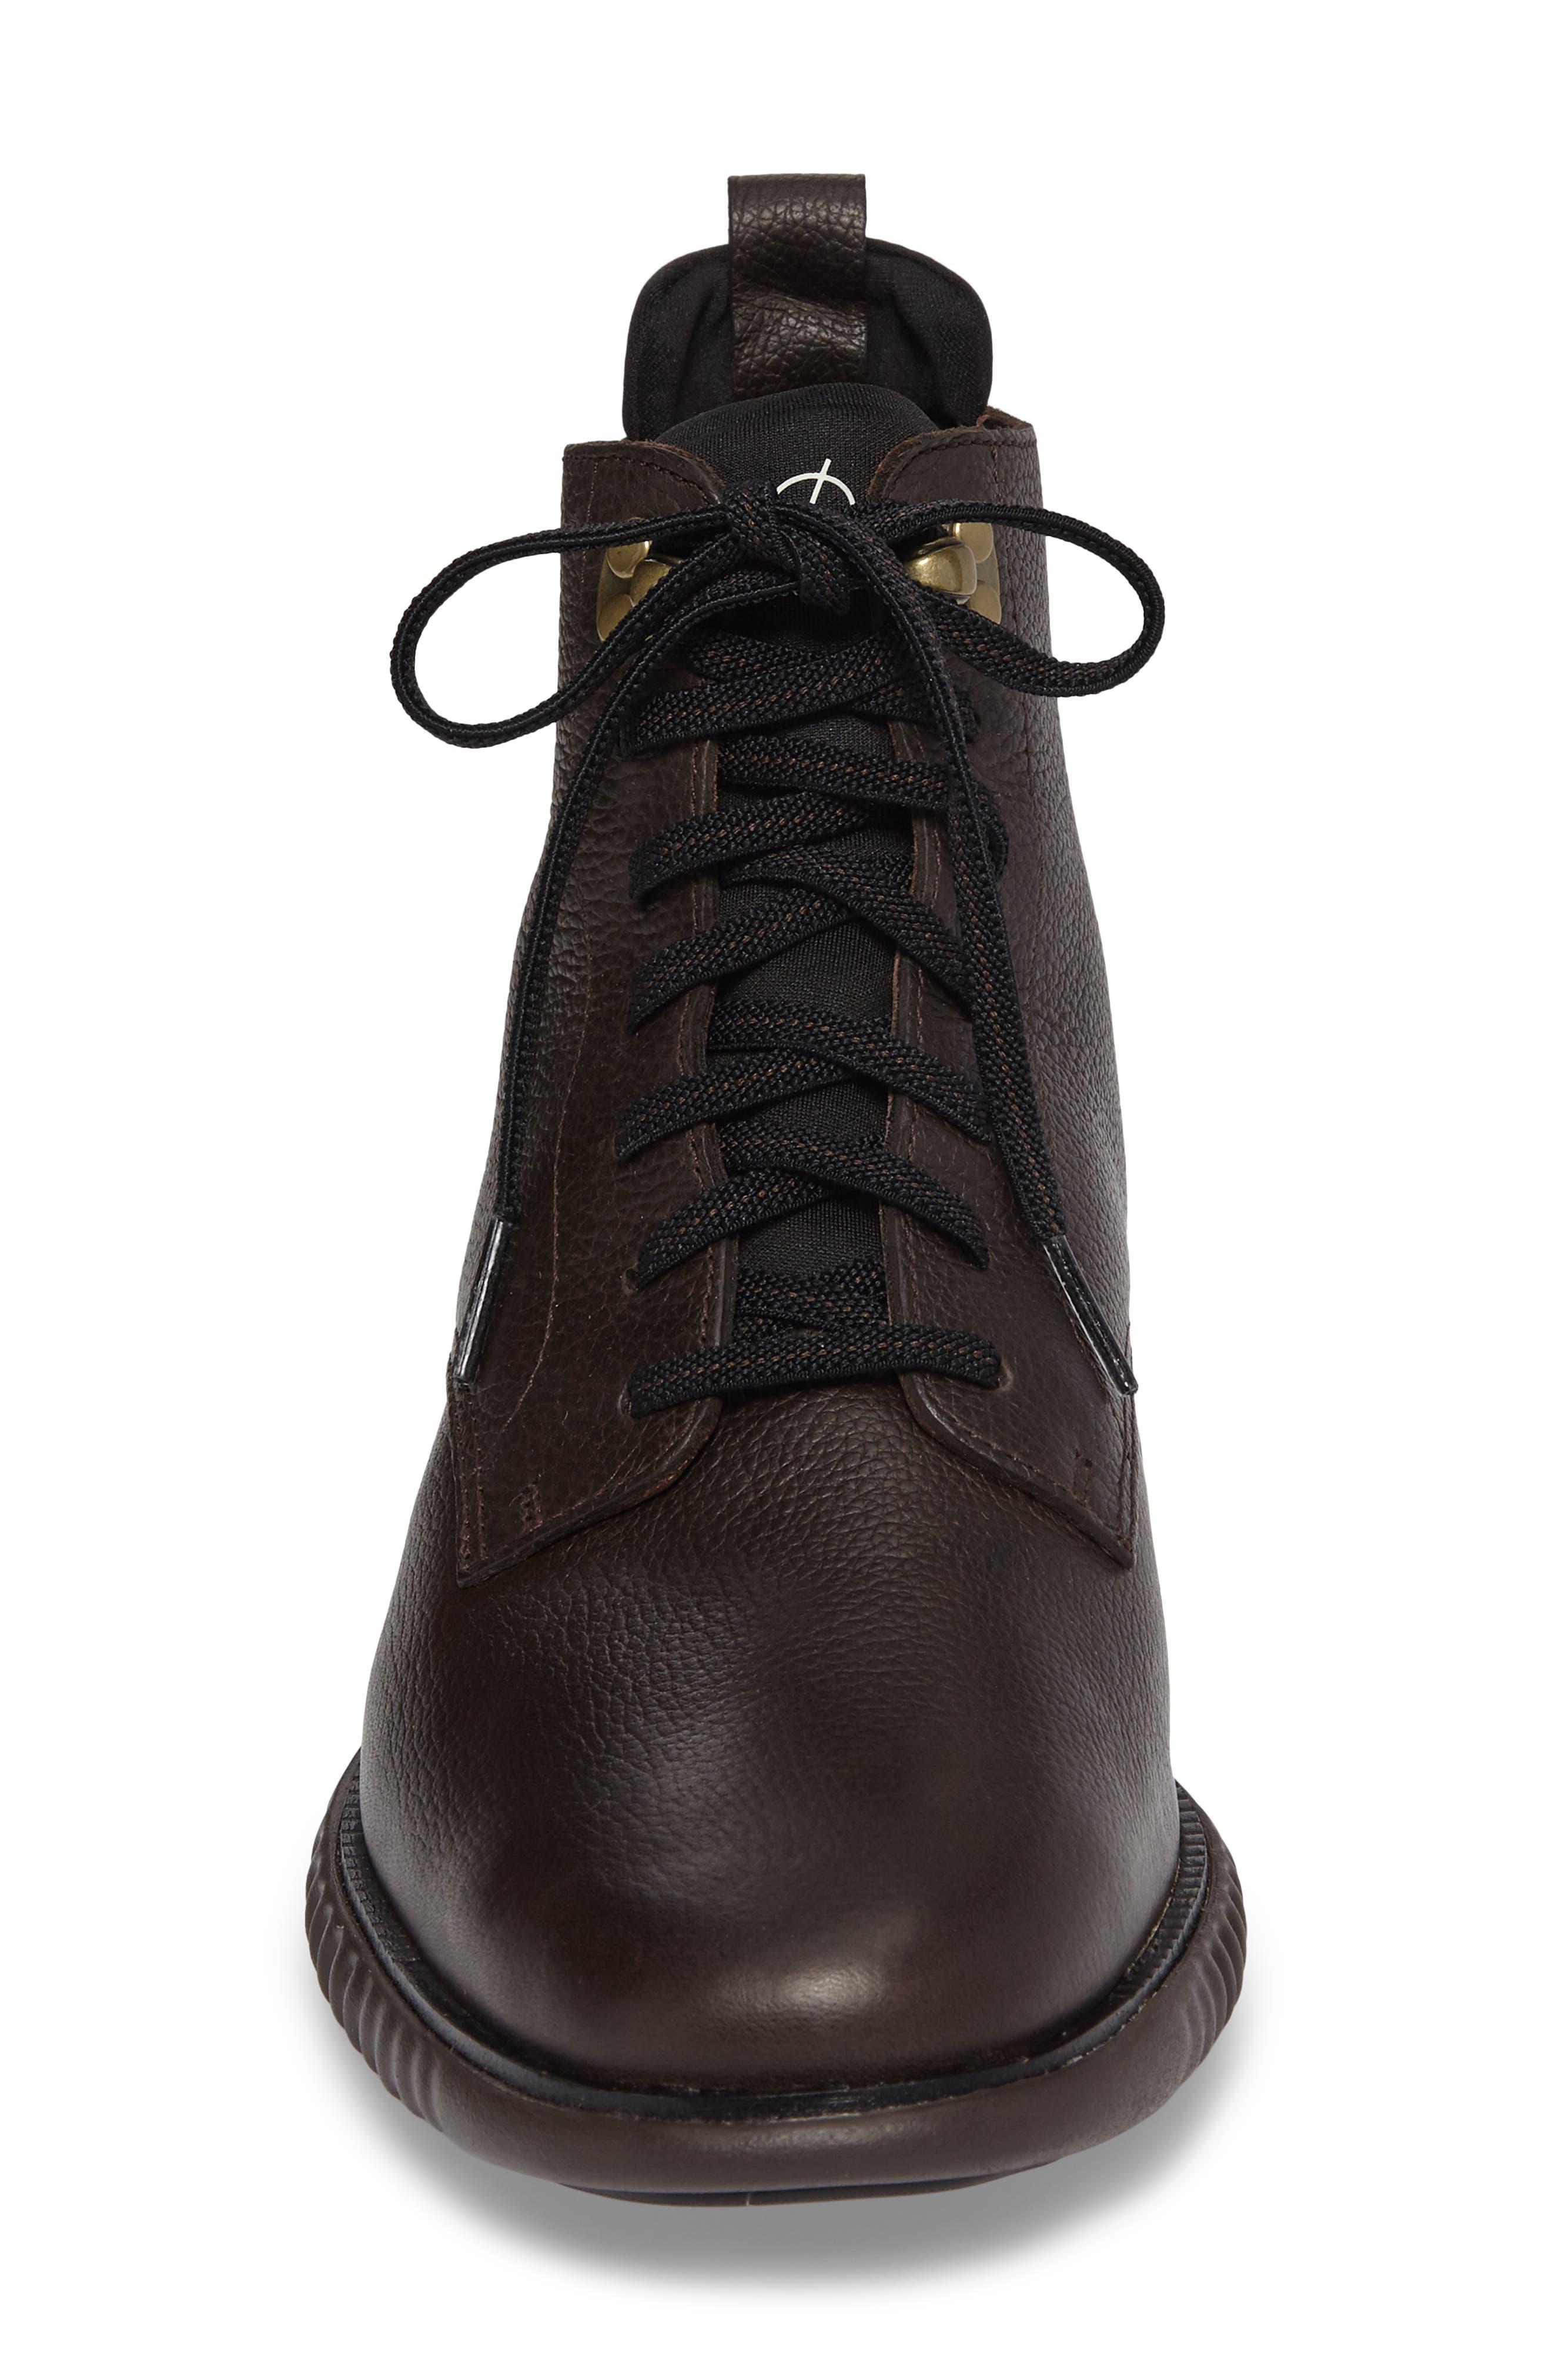 COLE HAAN,                             2.ZeroGrand Waterproof Boot,                             Alternate thumbnail 4, color,                             200